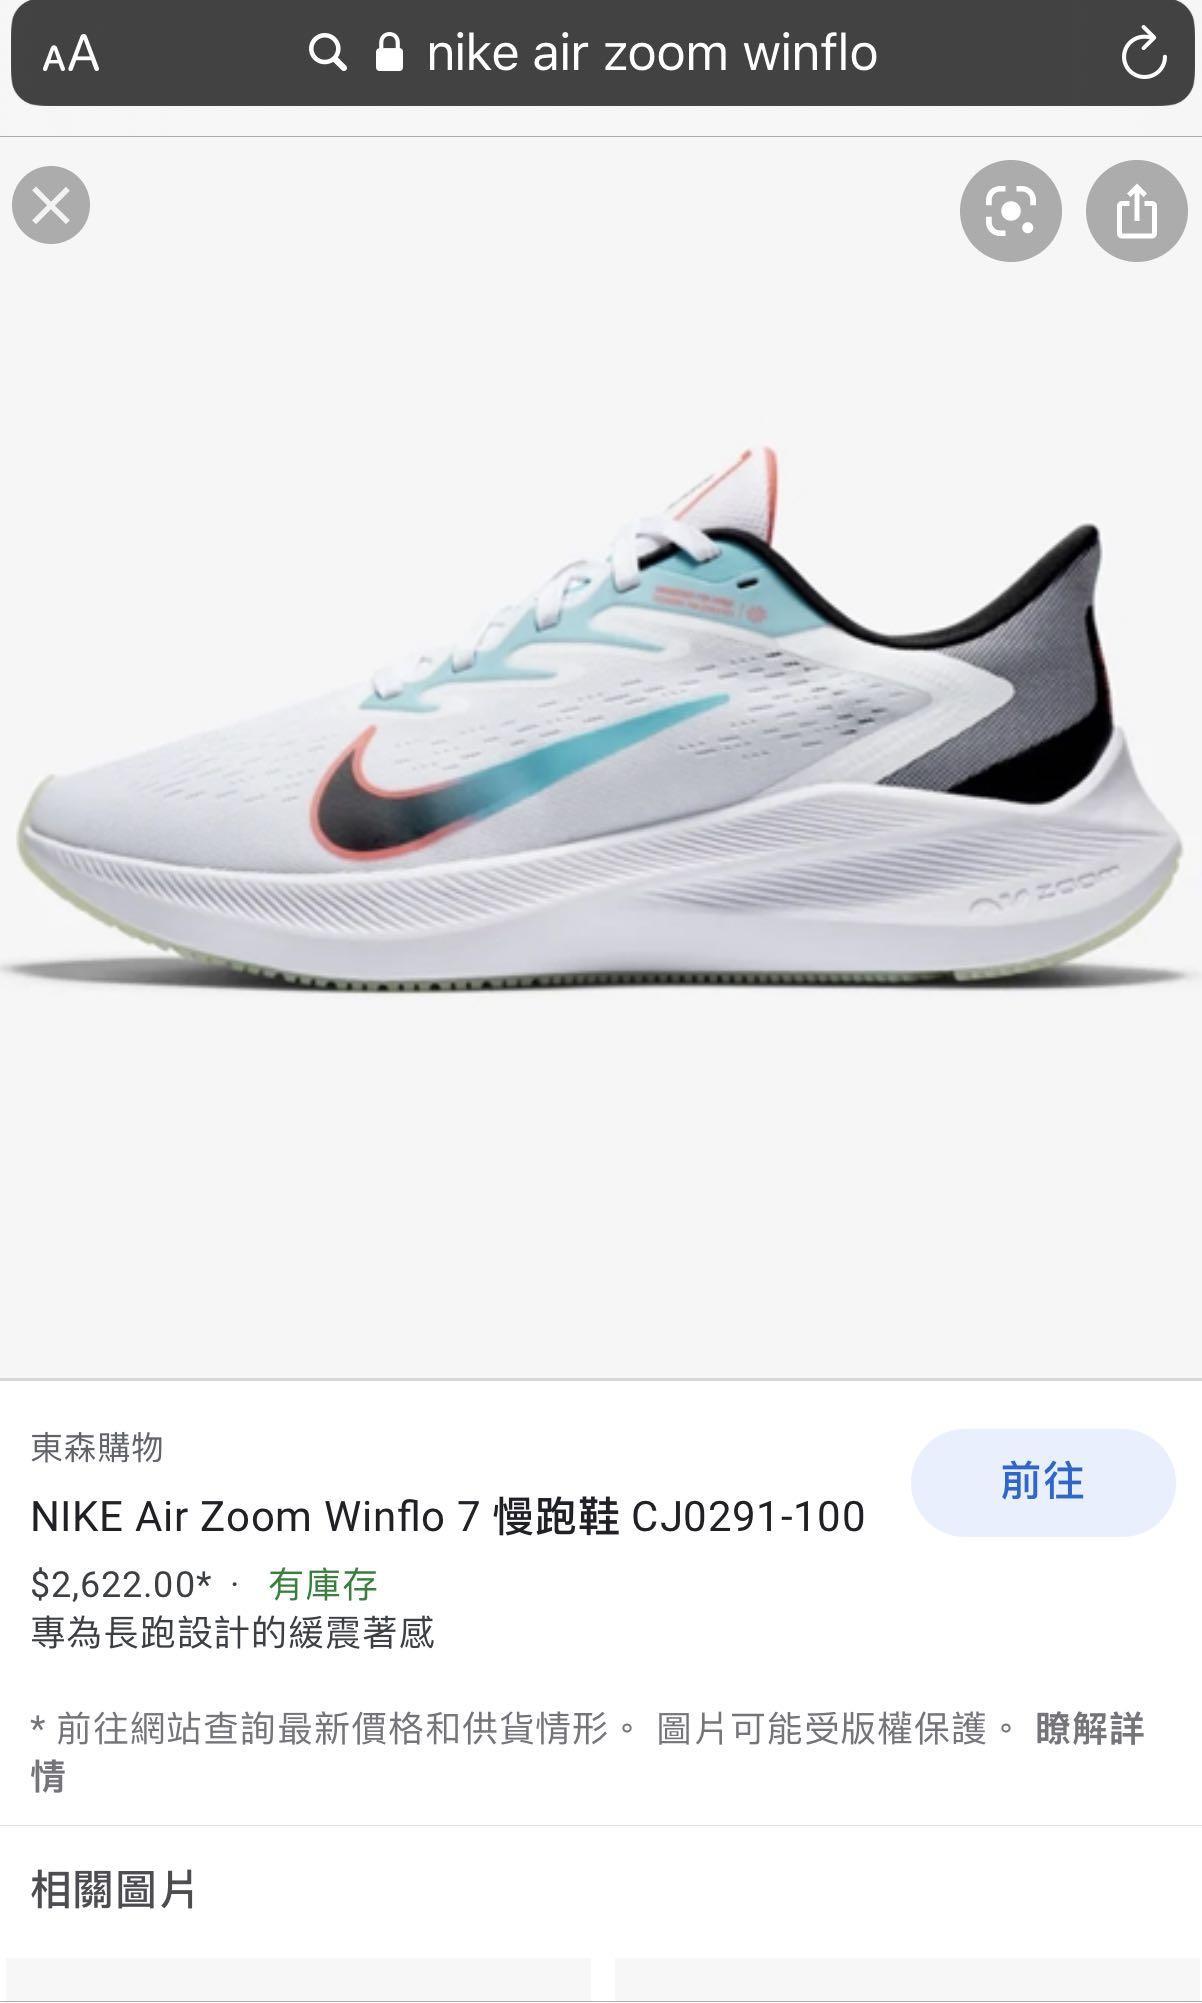 Nike Air Zoom Winflo 7 慢跑鞋